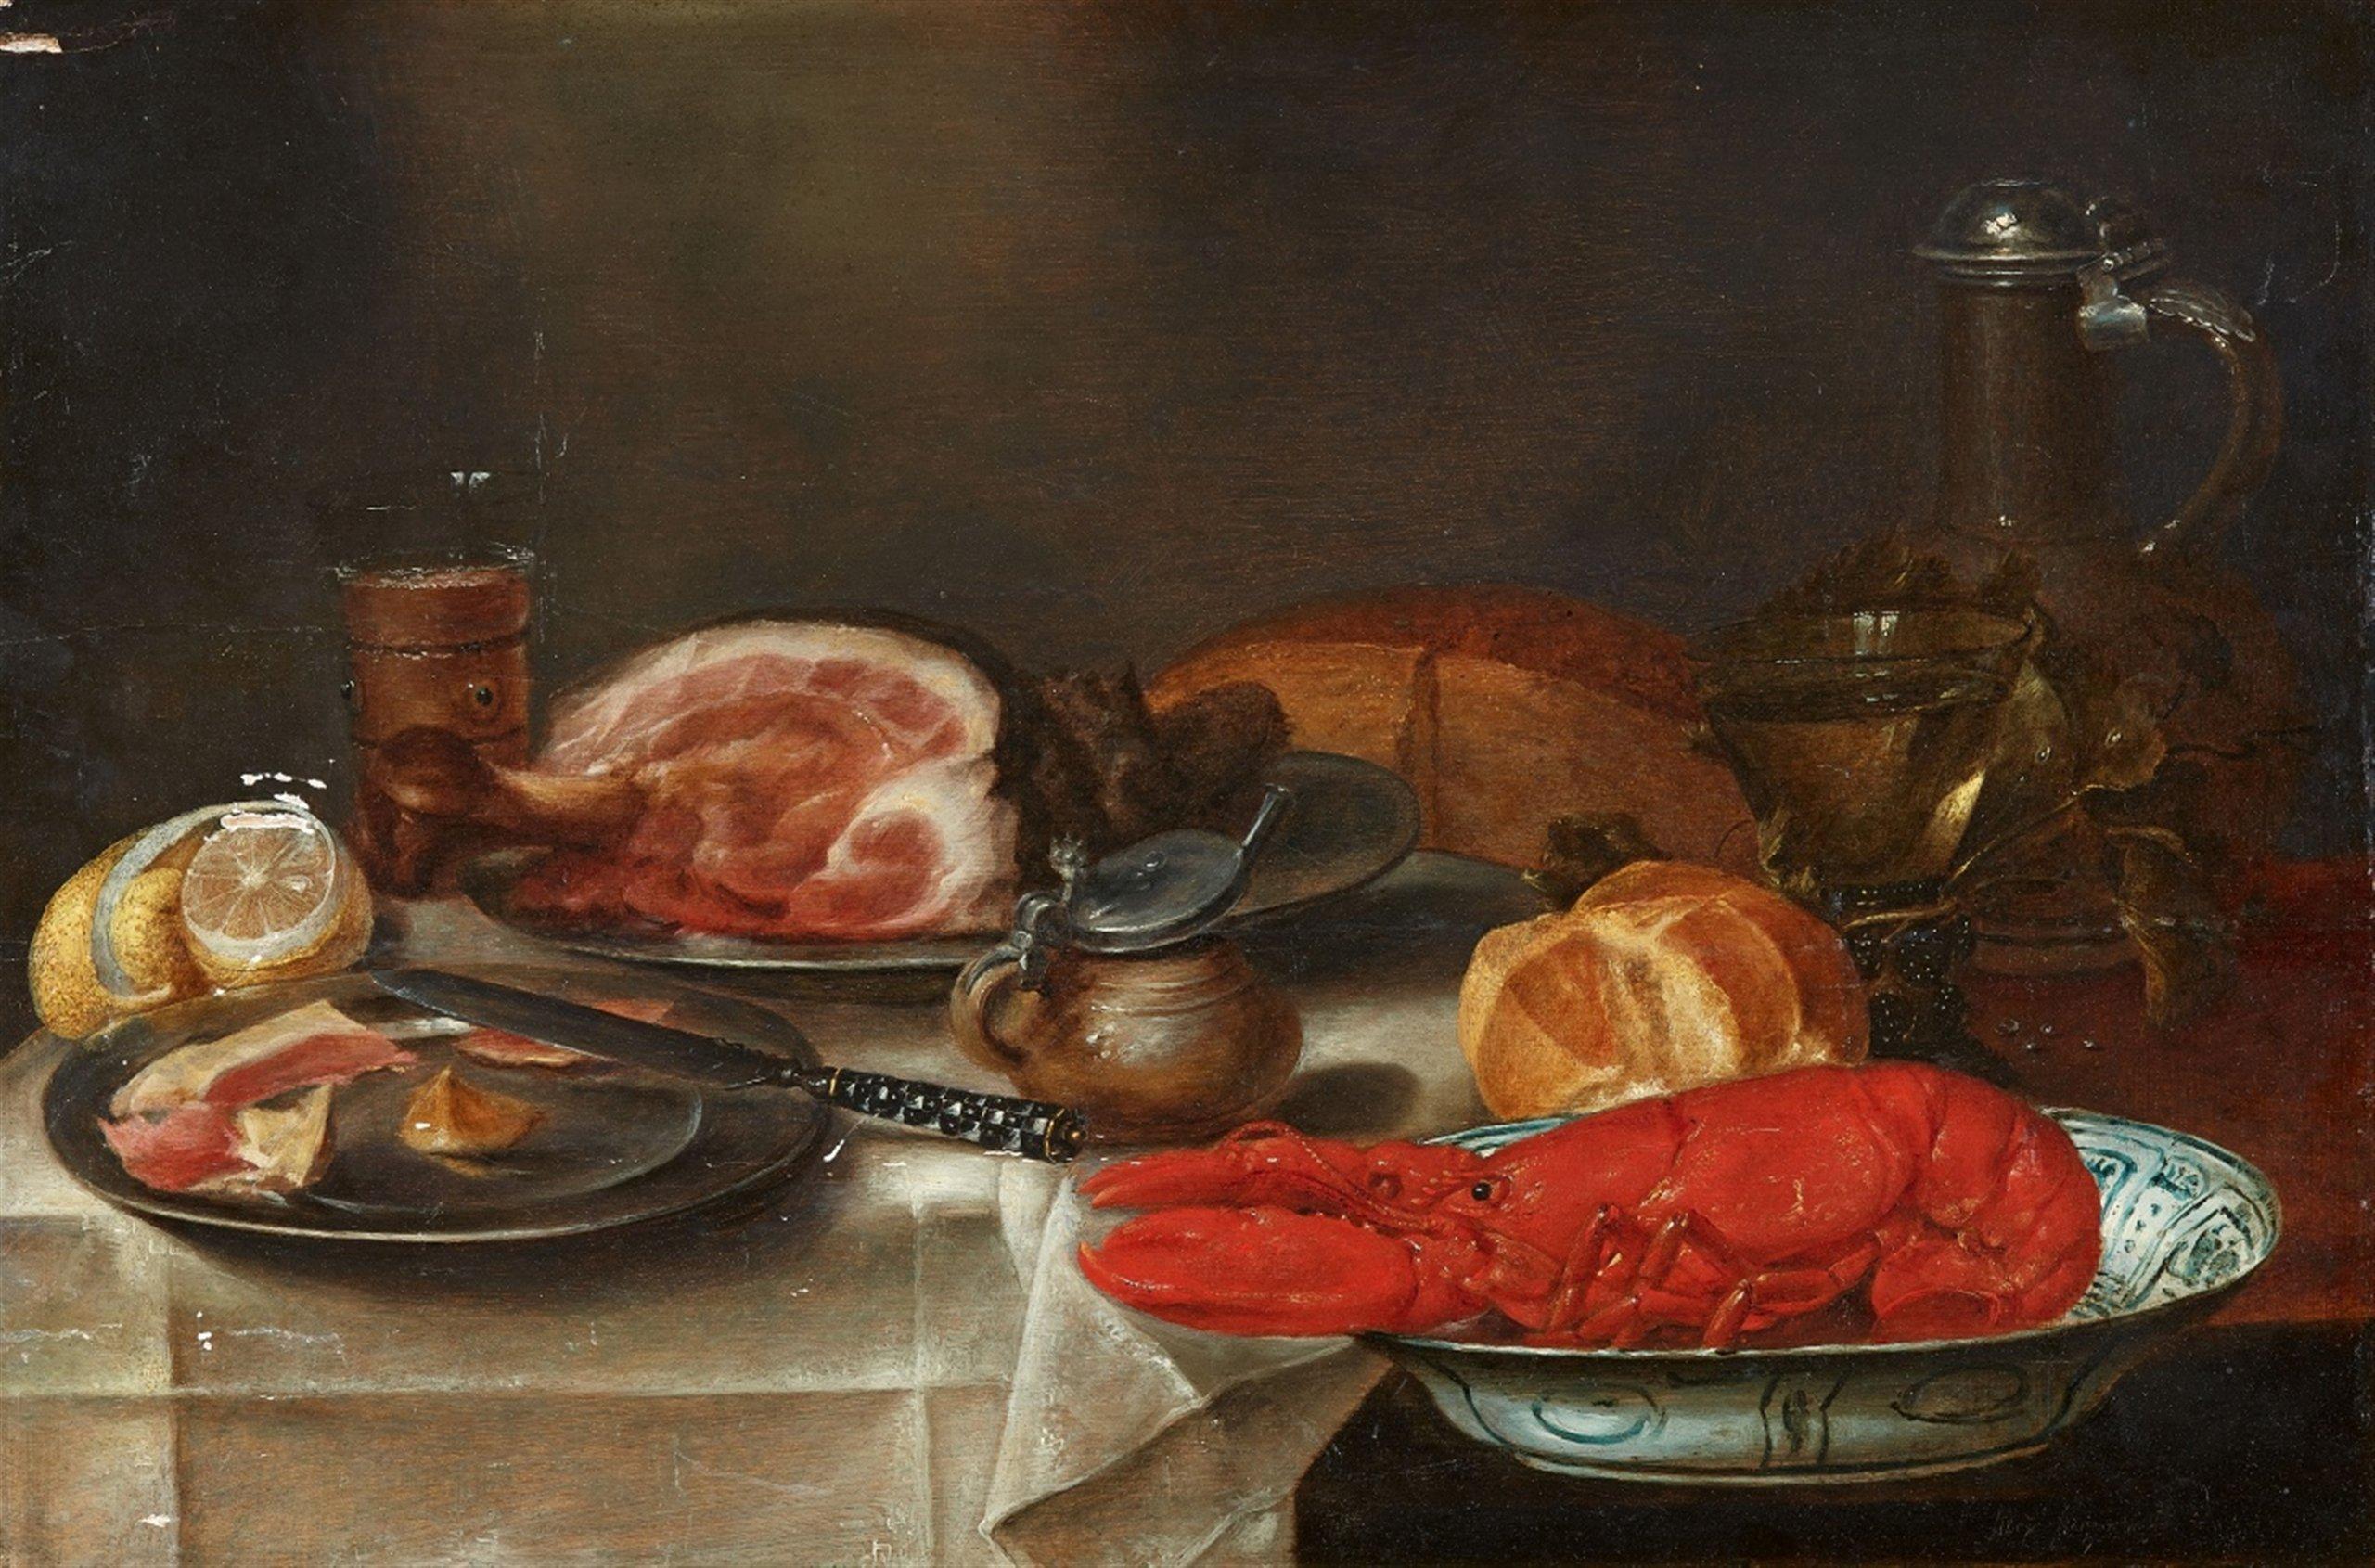 Alexander Adriaenssen (Anvers 1587 - 1661), Nature morte au homard - Lempertz. Estimation: 7000€ - 12 000€